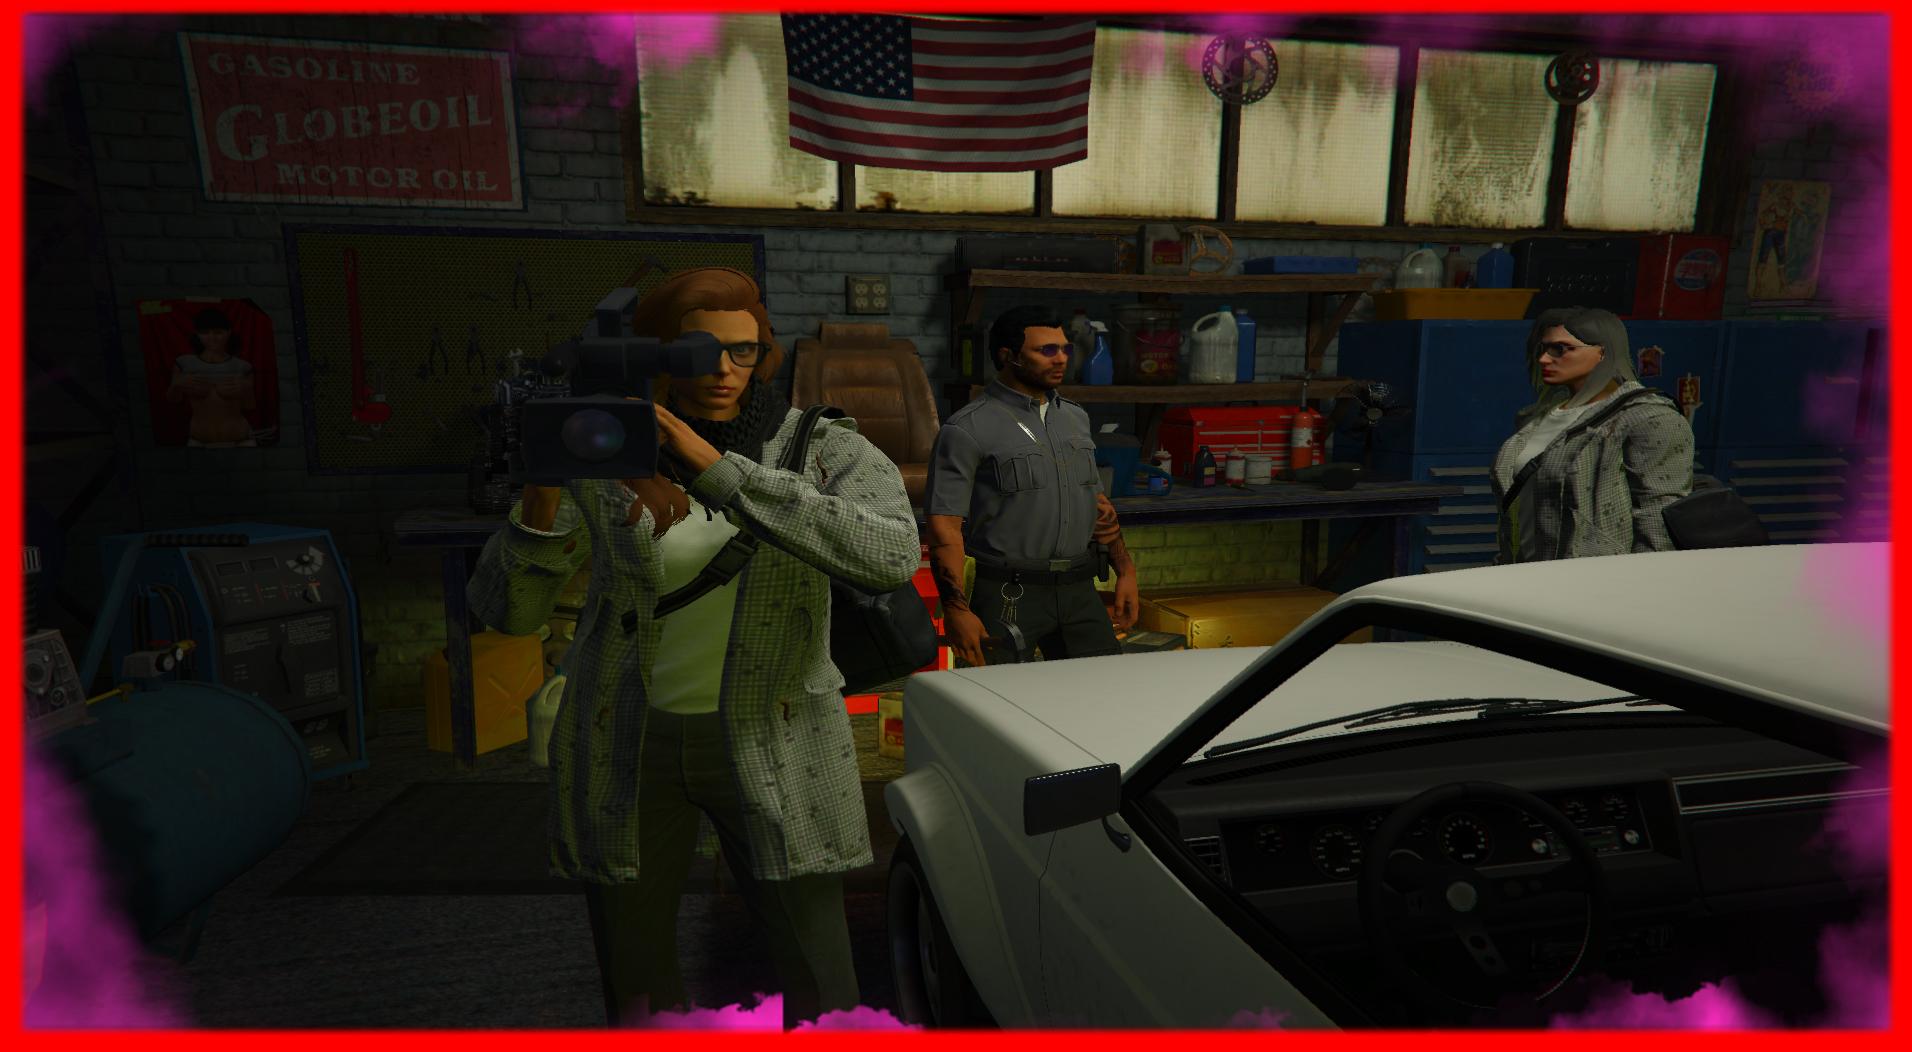 Grand_Theft_Auto_V_Screenshot_2021.02.26_-_00.30.jpg